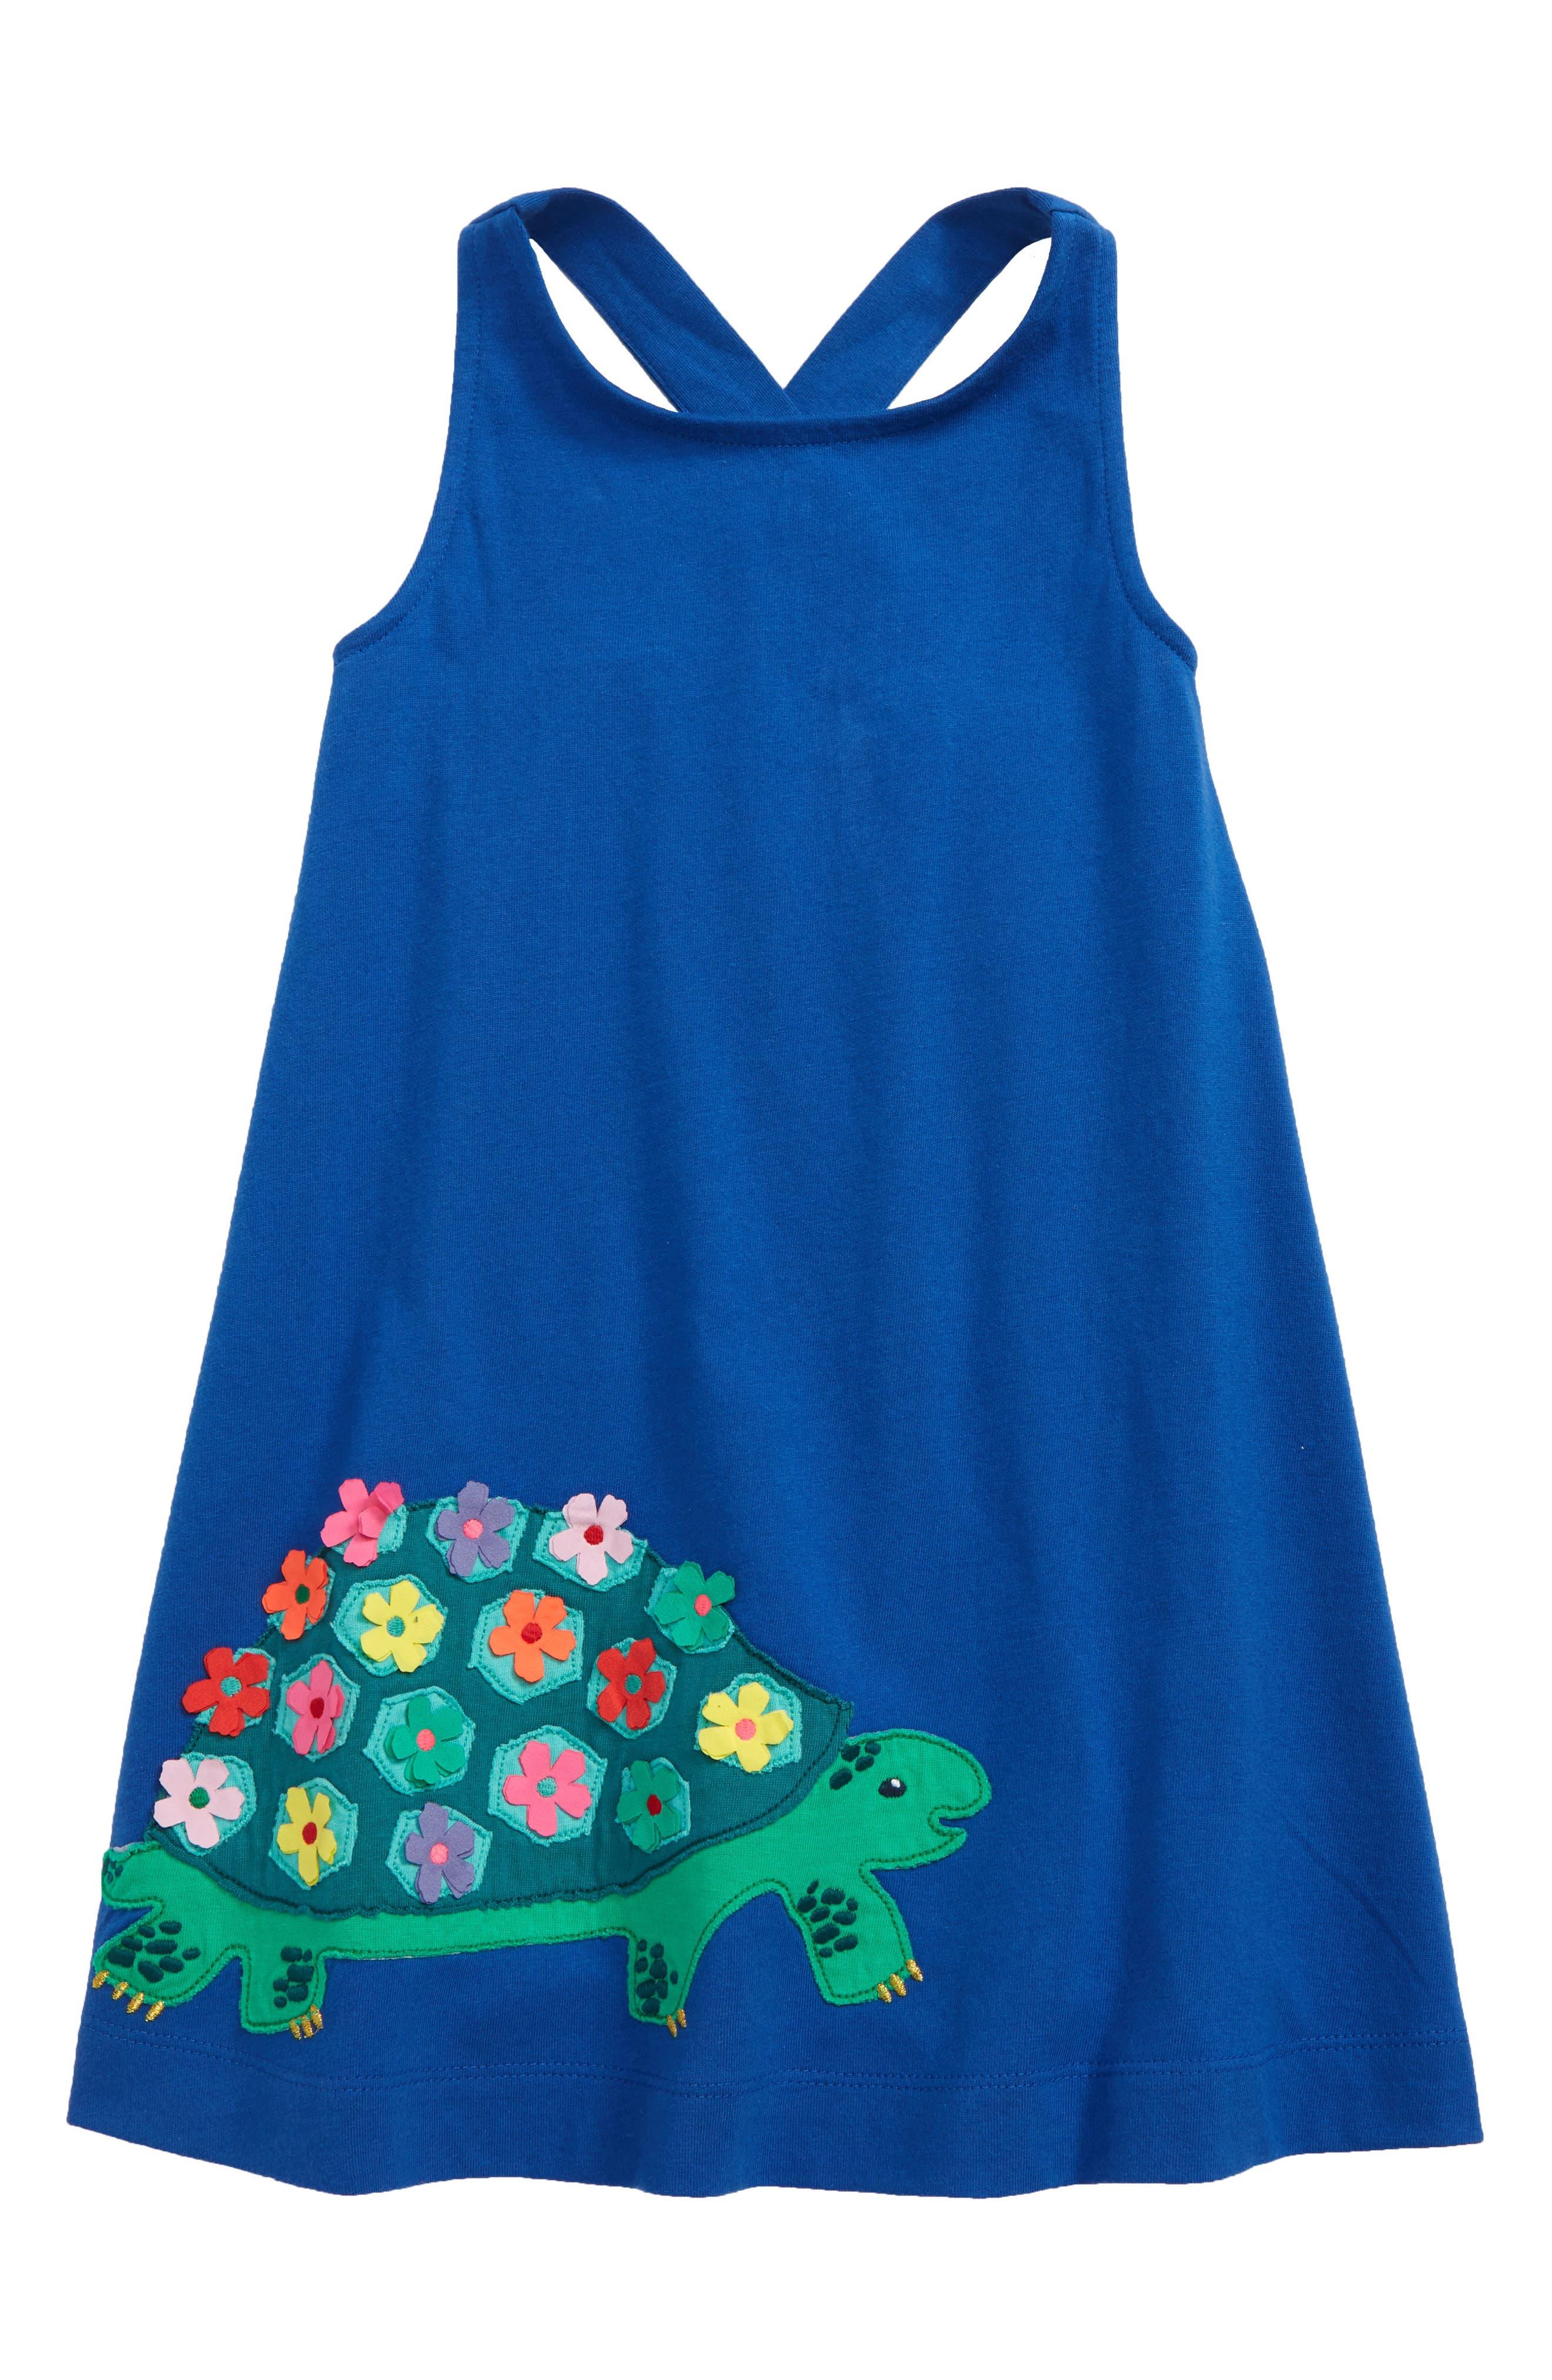 0c6061e8a130 Girl's Mini Boden Cross Back Applique Dress,6Y - Blue